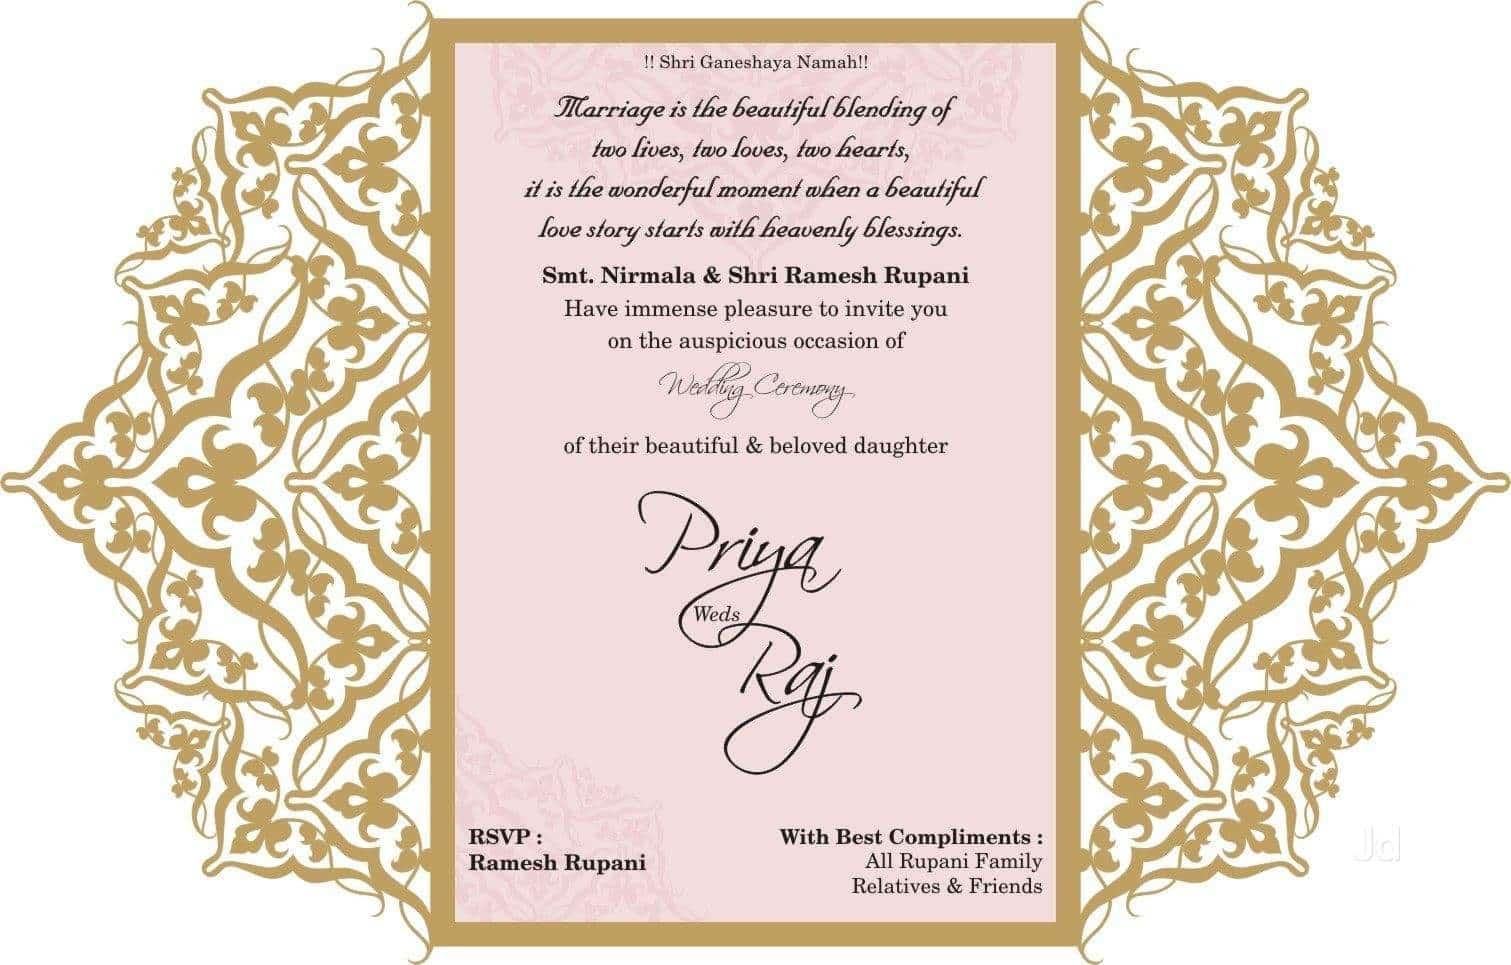 Ambika wedding cards raja park ambica wedding cards printers ambika wedding cards raja park ambica wedding cards printers for visiting card in jaipur justdial stopboris Gallery